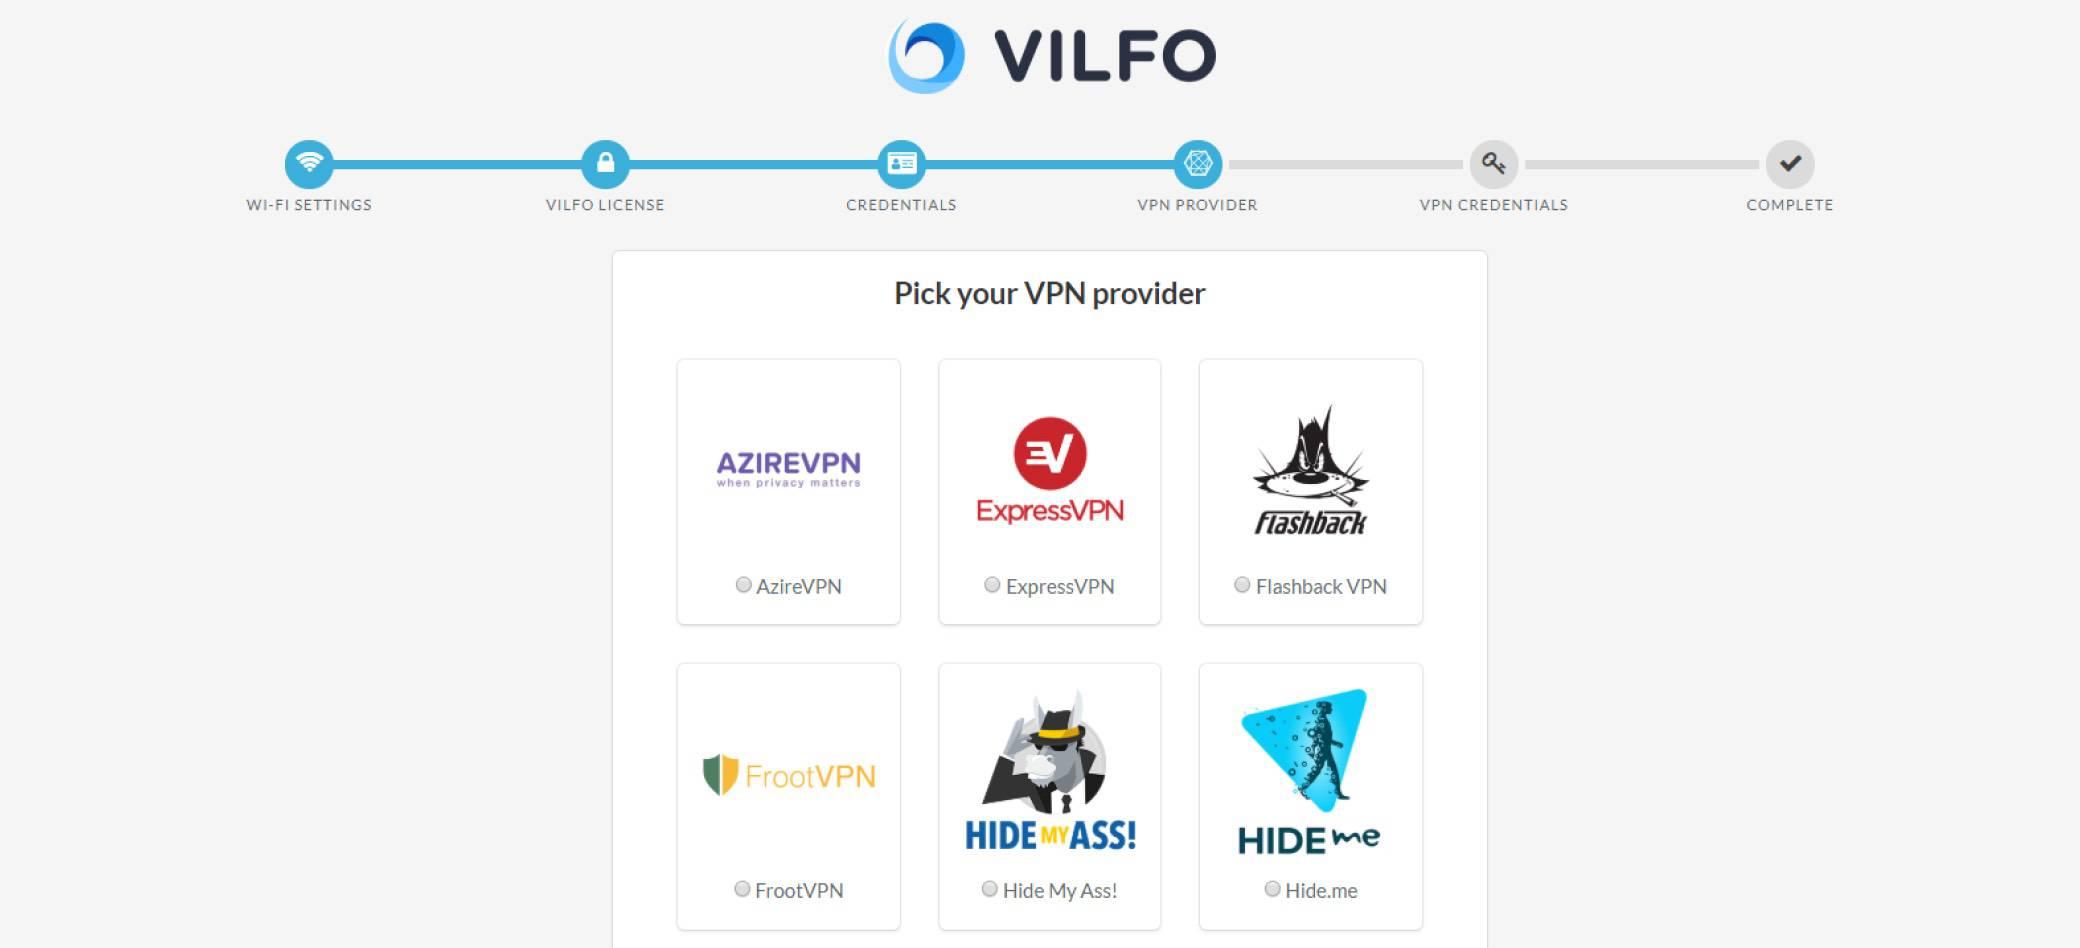 vilfo-providers image